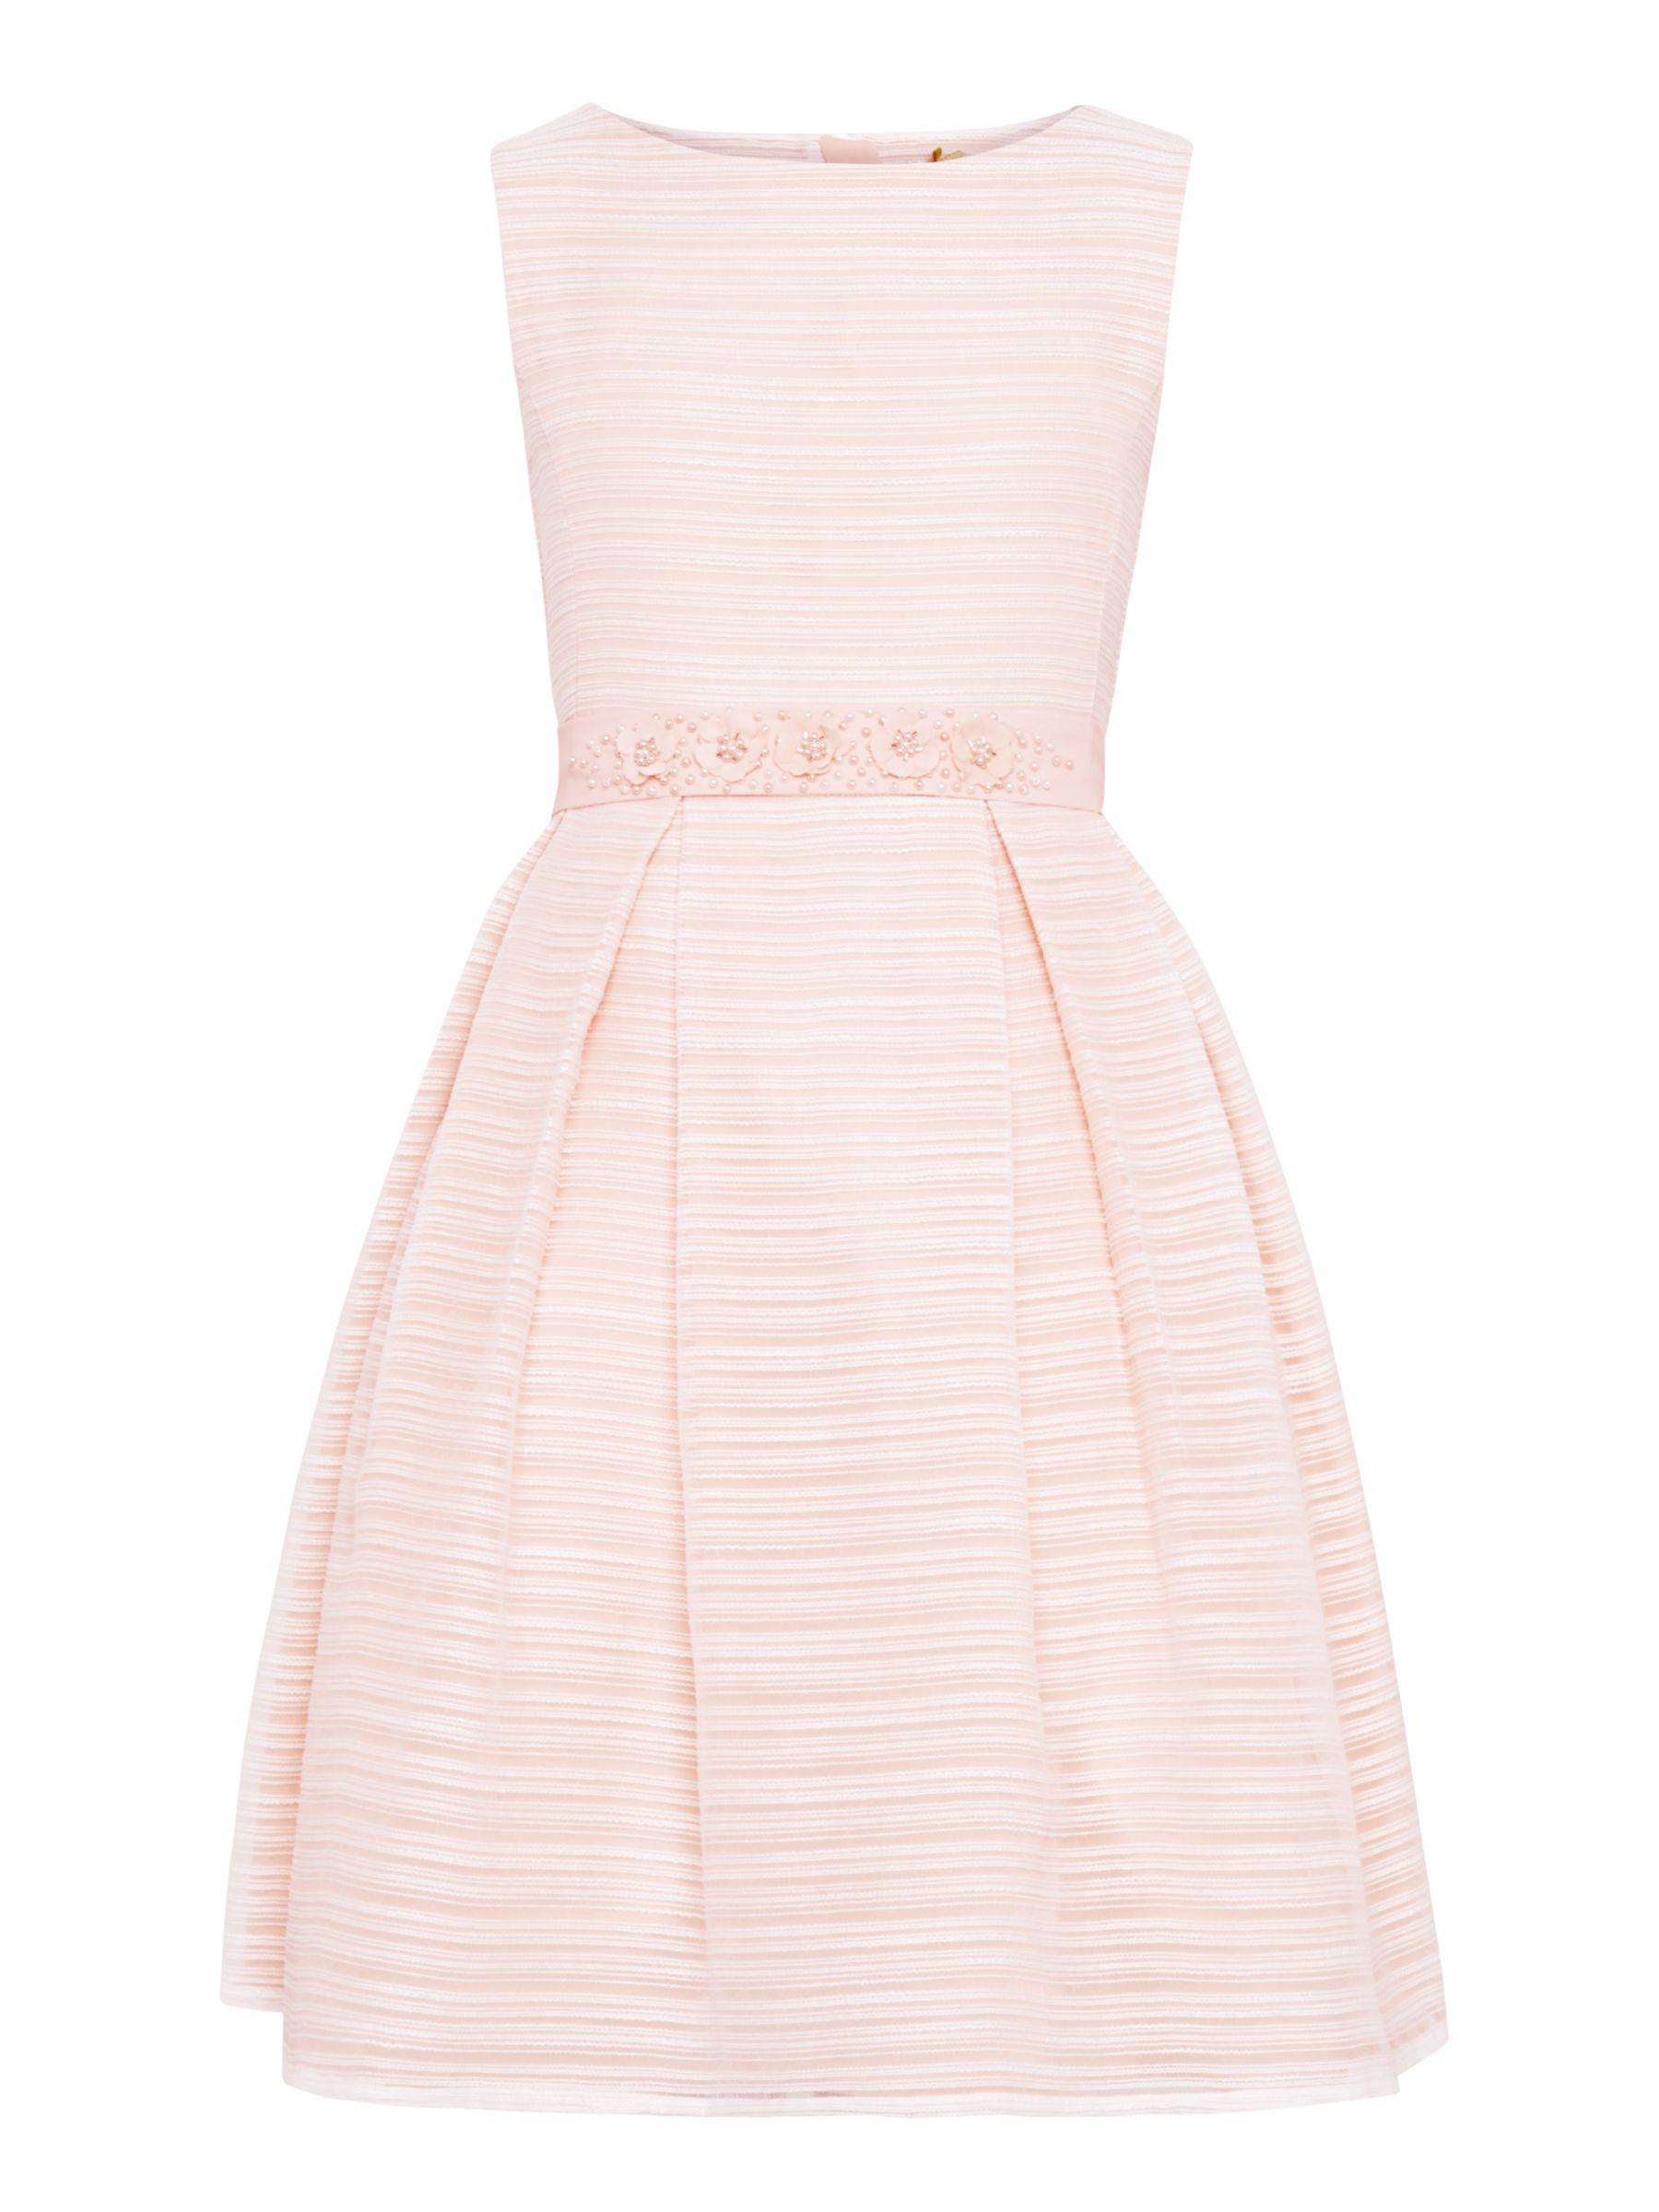 John Lewis Heirloom Collection John Lewis Heirloom Collection Girls' Organza Stripe Dress, Pink